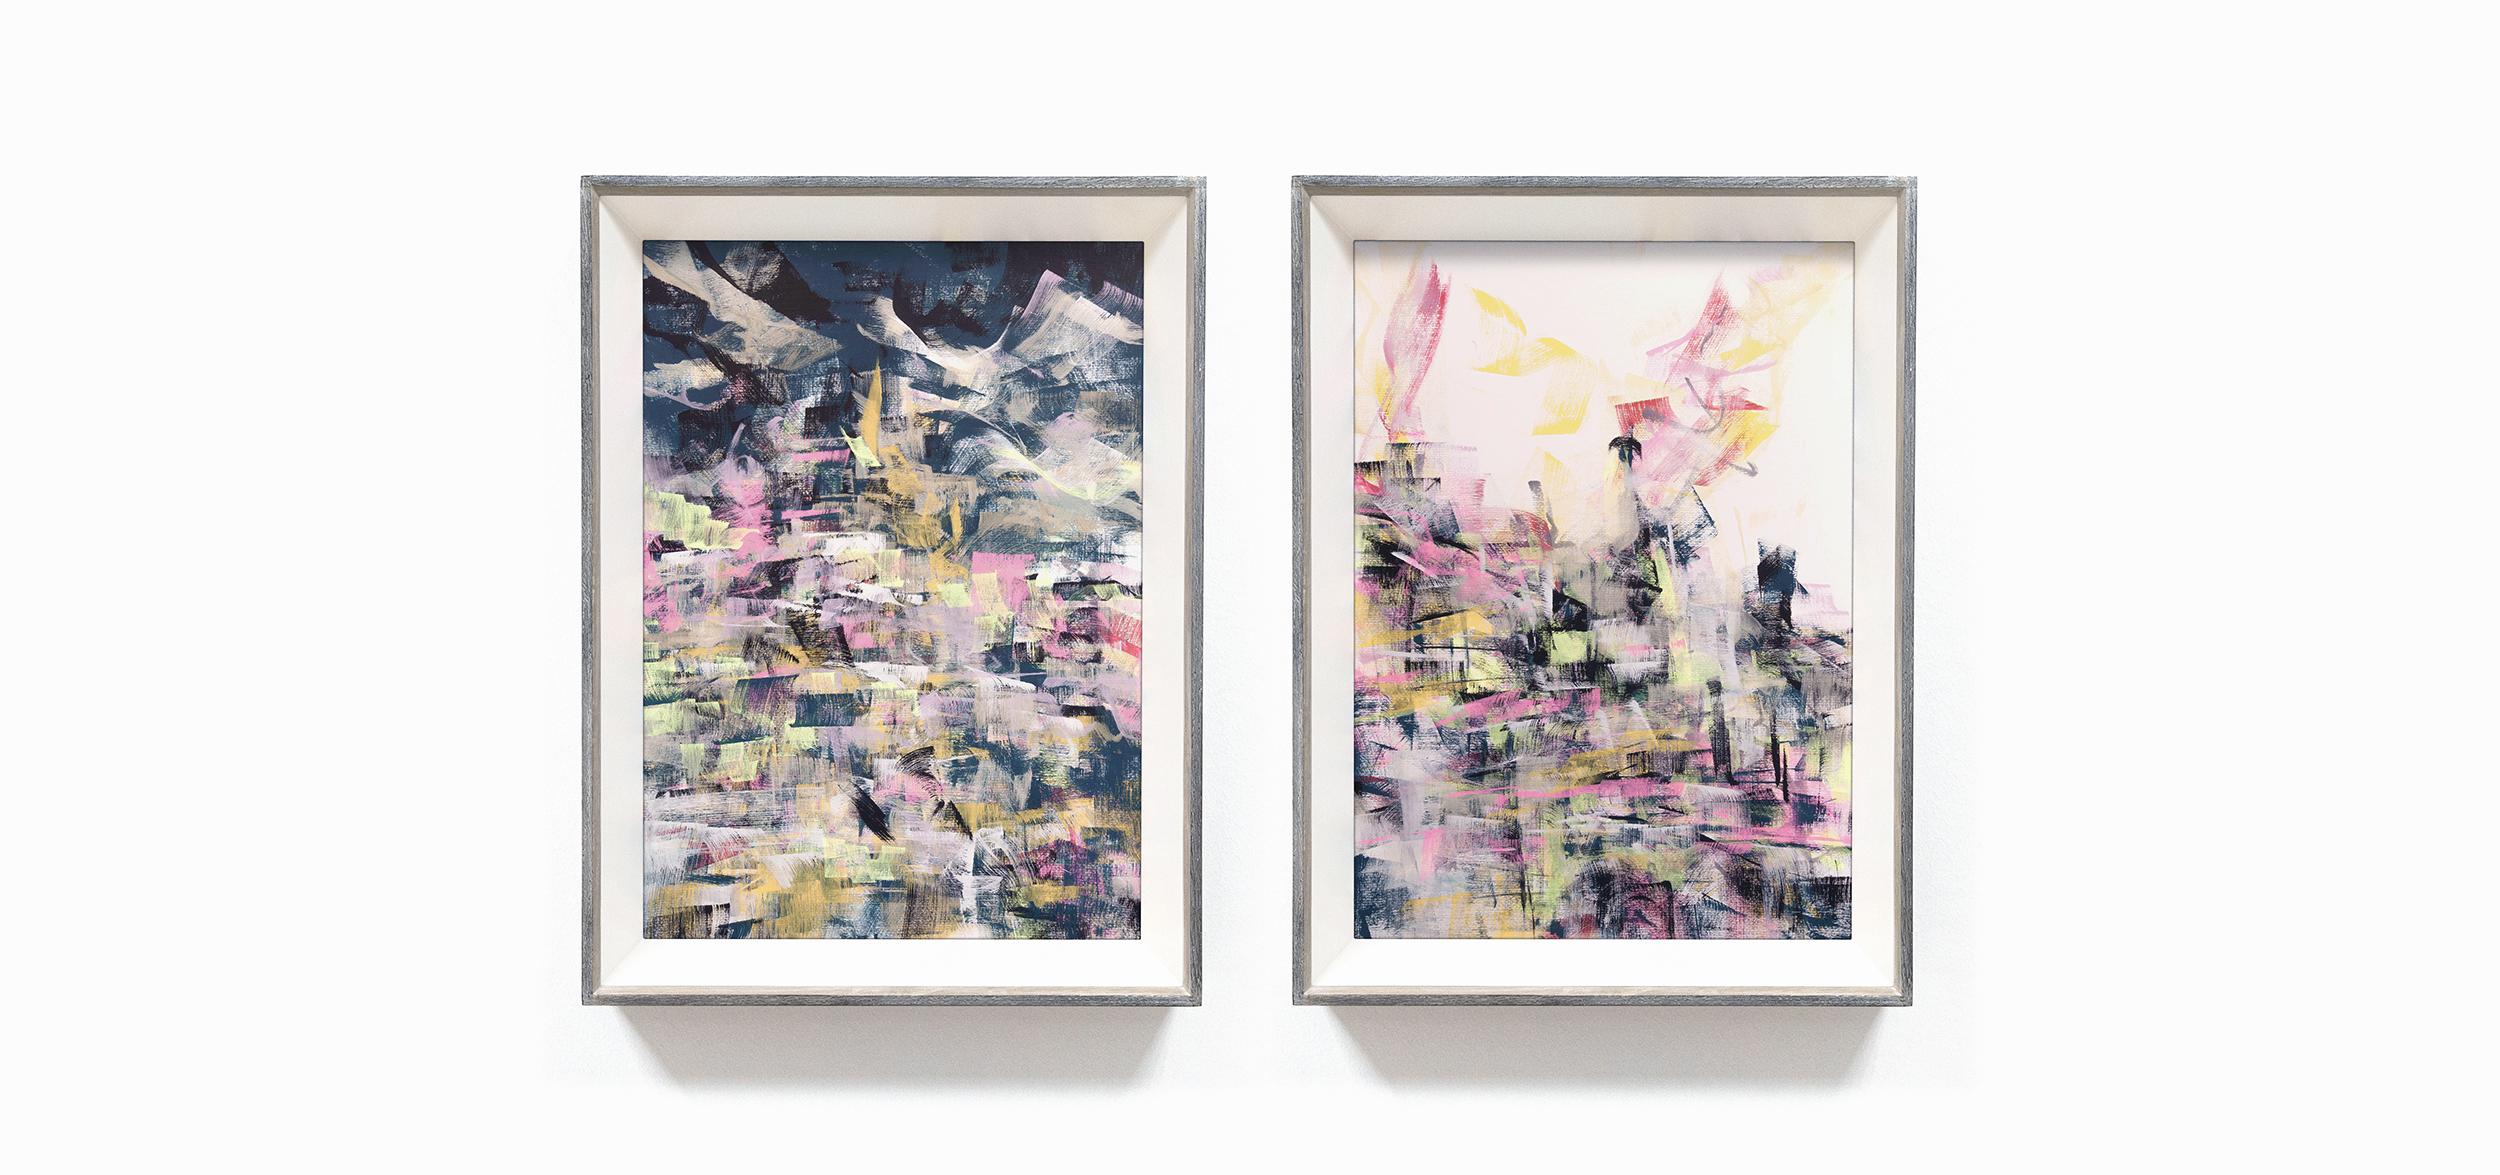 bonjourmolotov+Untitled+Illustration+Ilustracao+painting+pintura+acrylic+acrílico+canvas+tela+paper+cardboard+mdf+Andre+Gigante+11N10.jpg